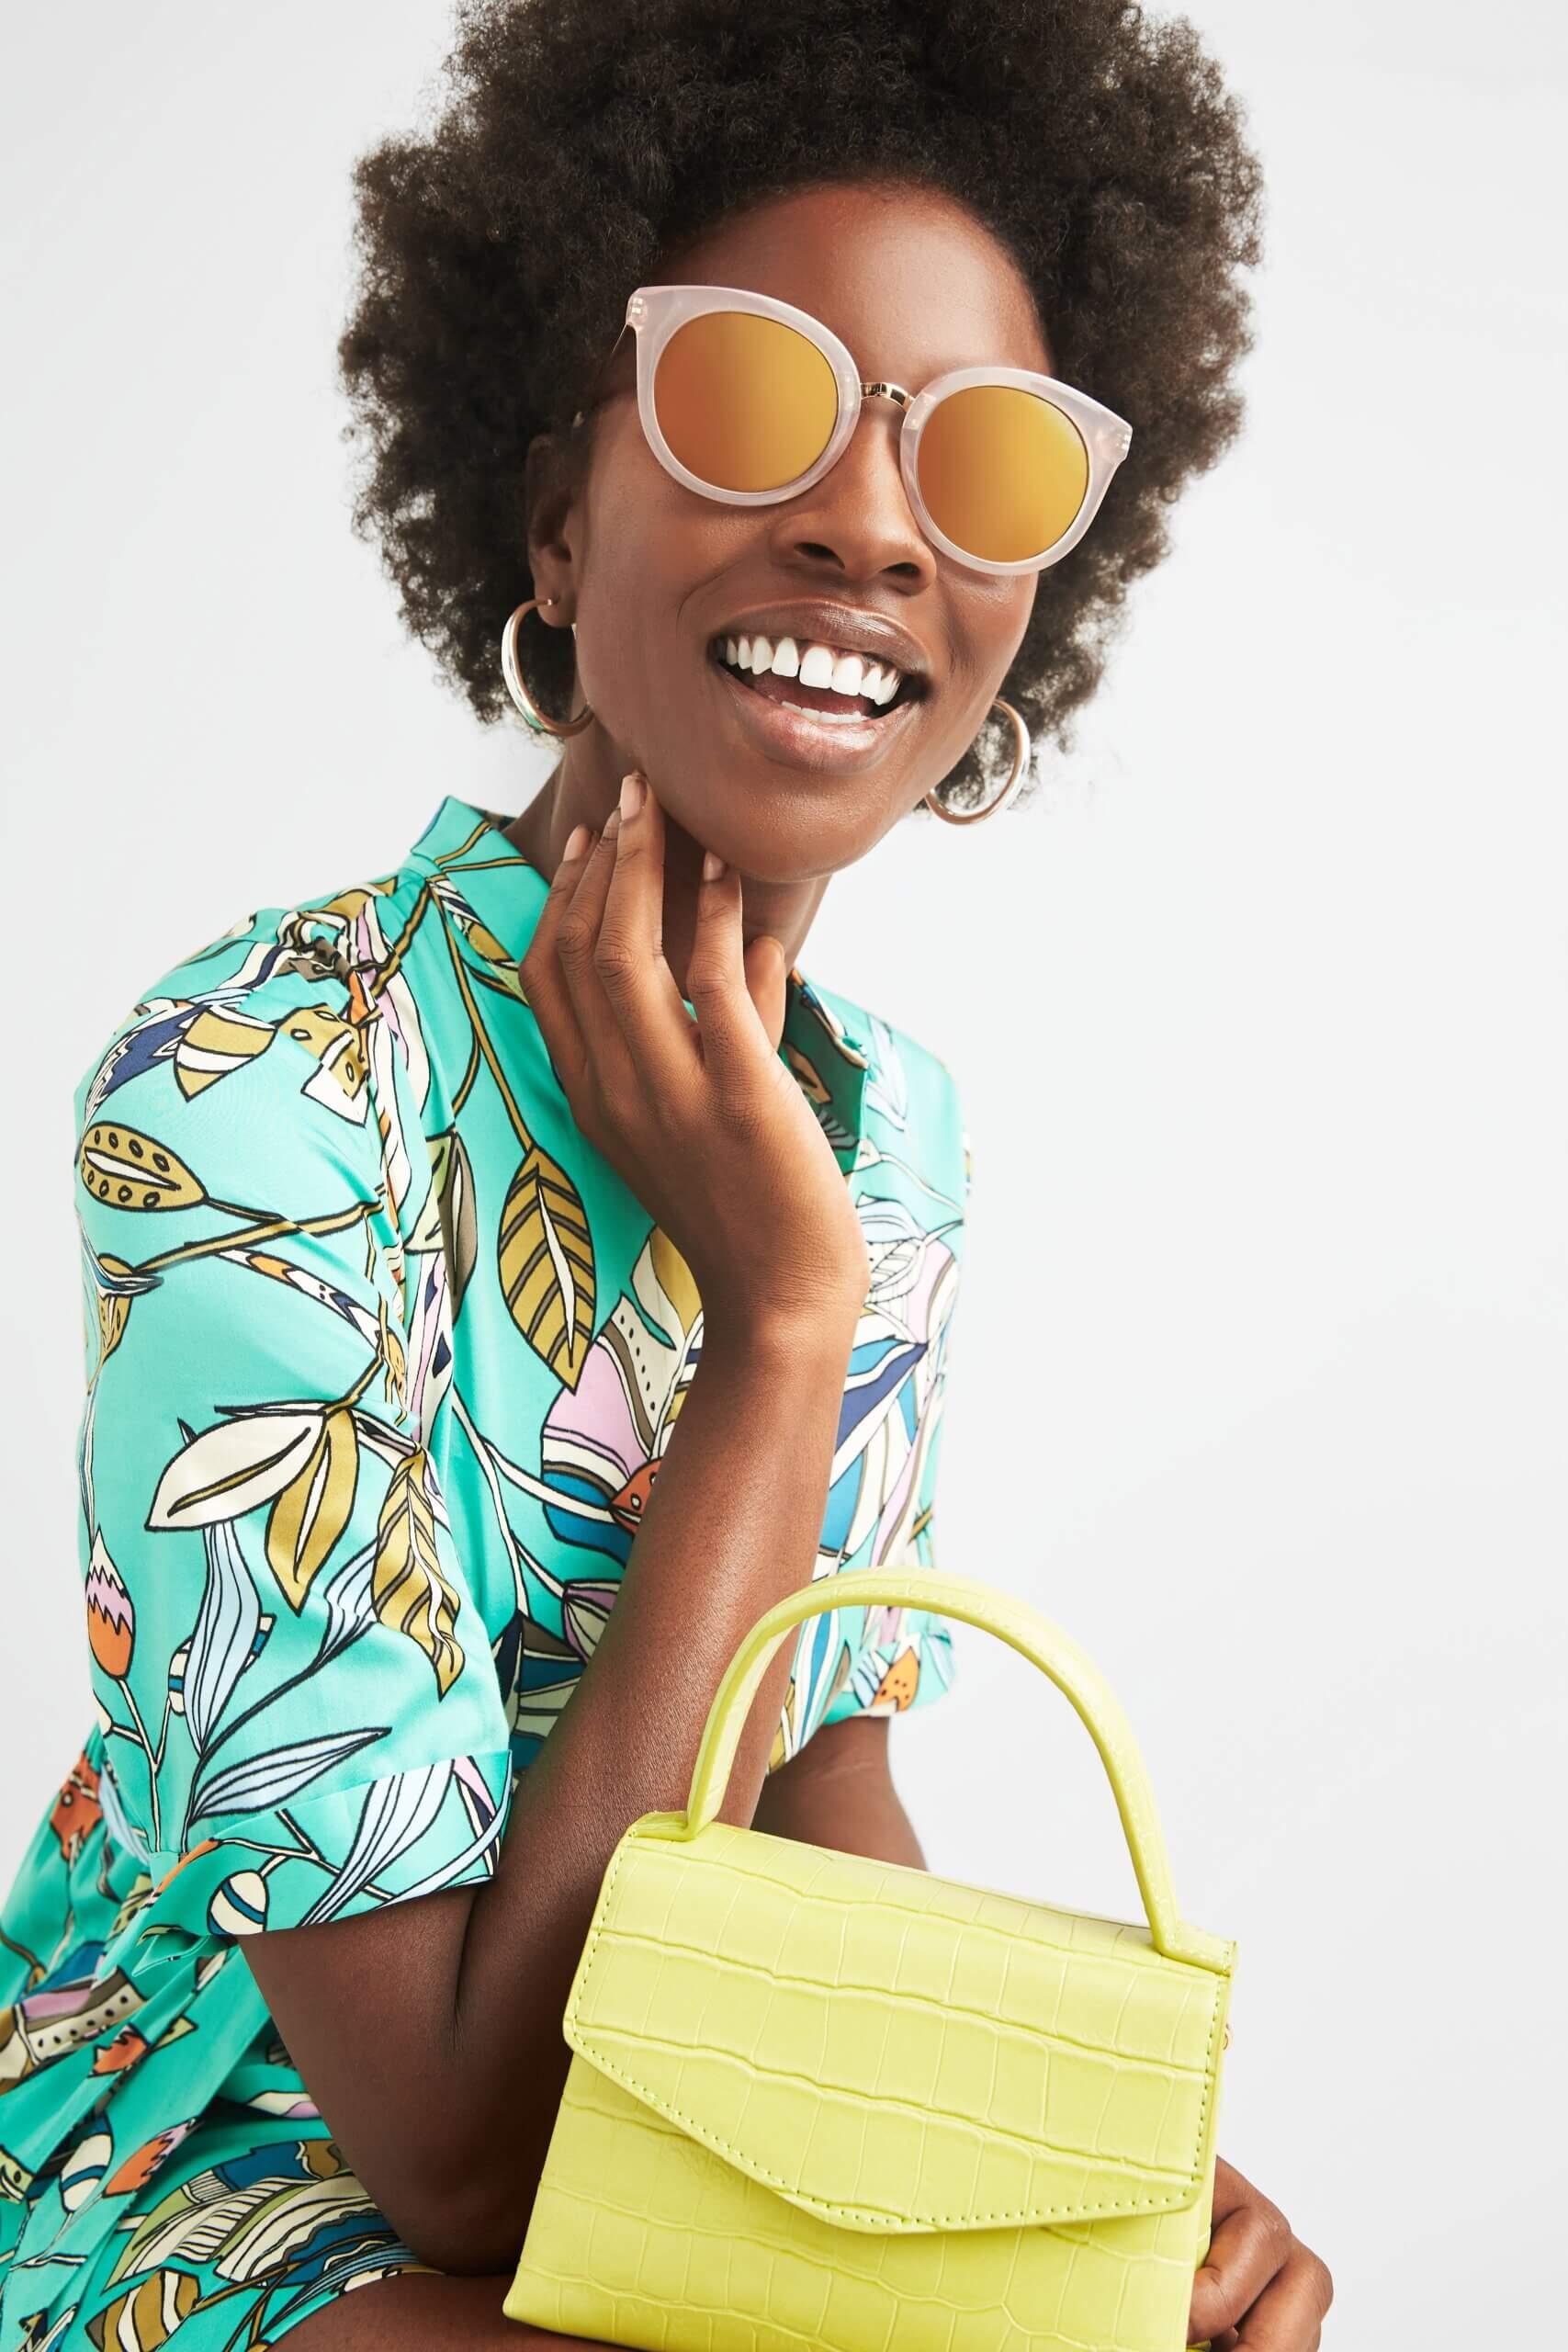 Stitch Fix Women's model wearing gold hoop earrings, sunglasses, green leaf-print romper and a lime green clutch.